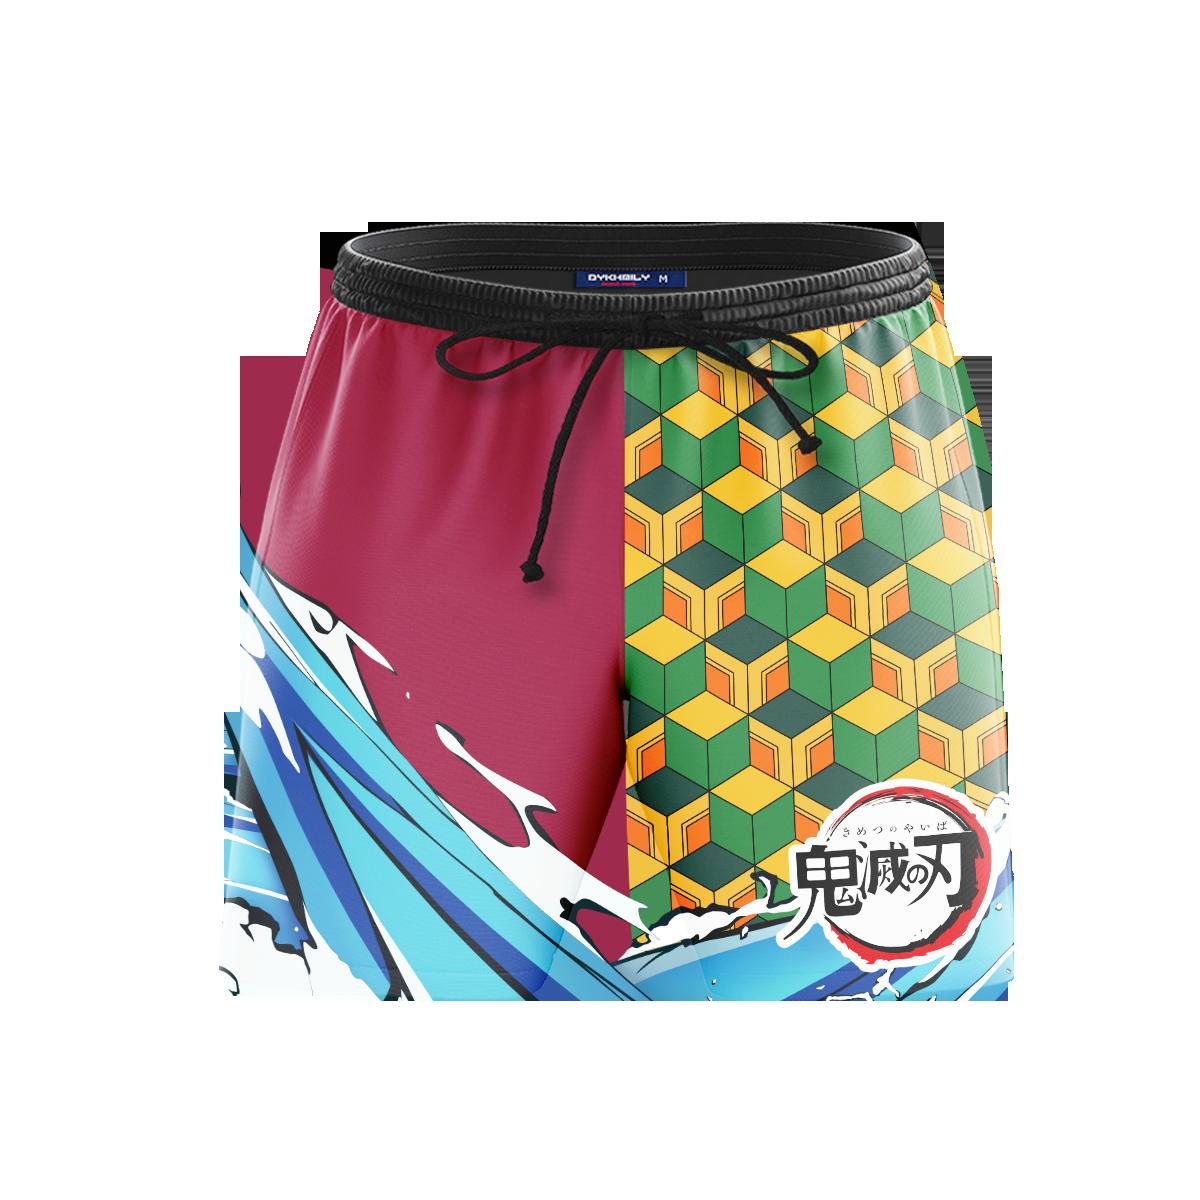 Slayer Giyu Beach Shorts FDM3107 S Official Anime Swimsuit Merch